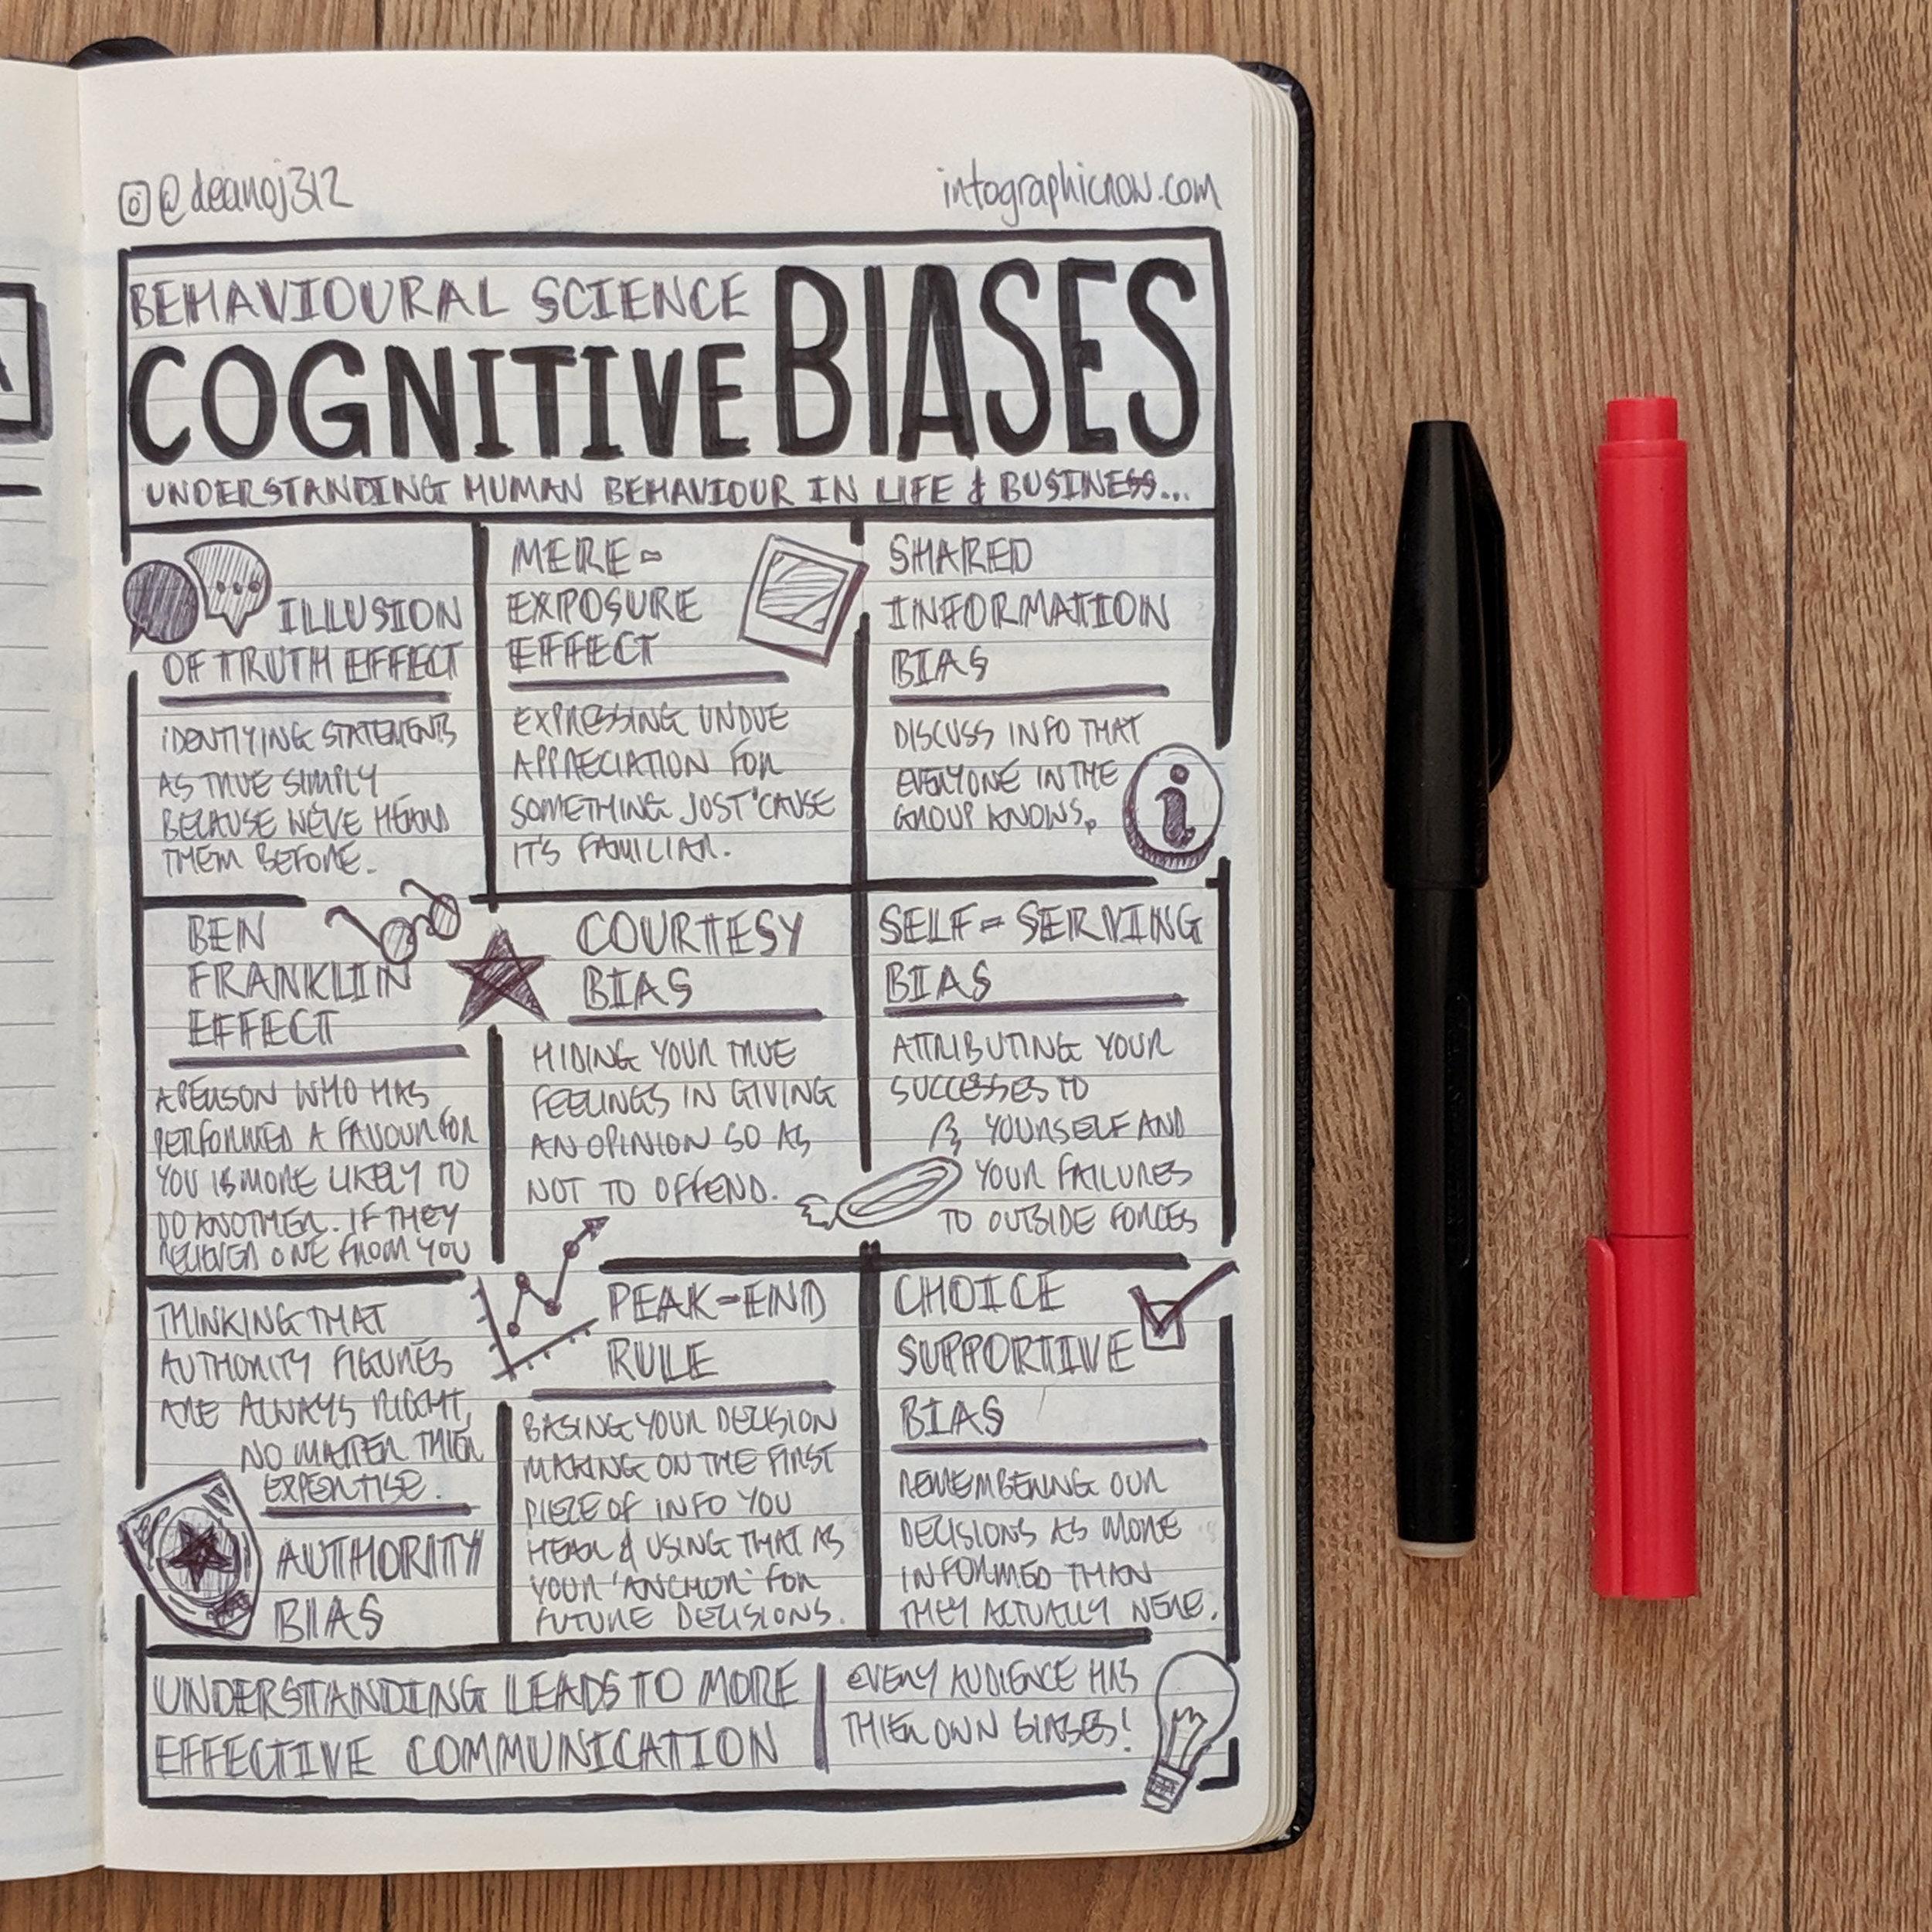 CognitiveBias1.jpg